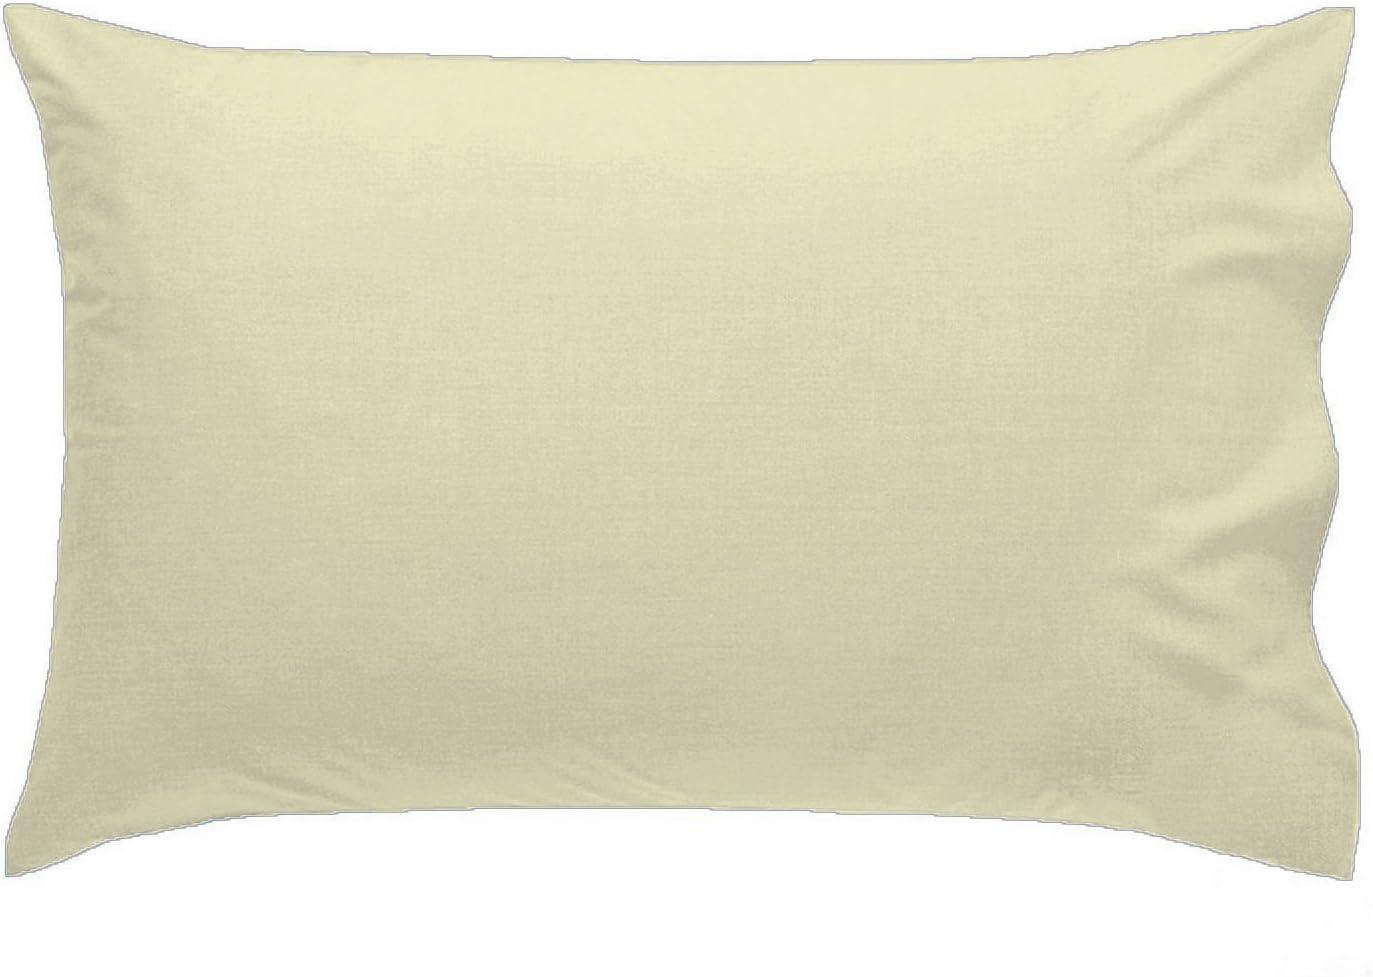 Black R/&Z Plain Dyed Polycotton Housewife New 2 x Pillow Cases